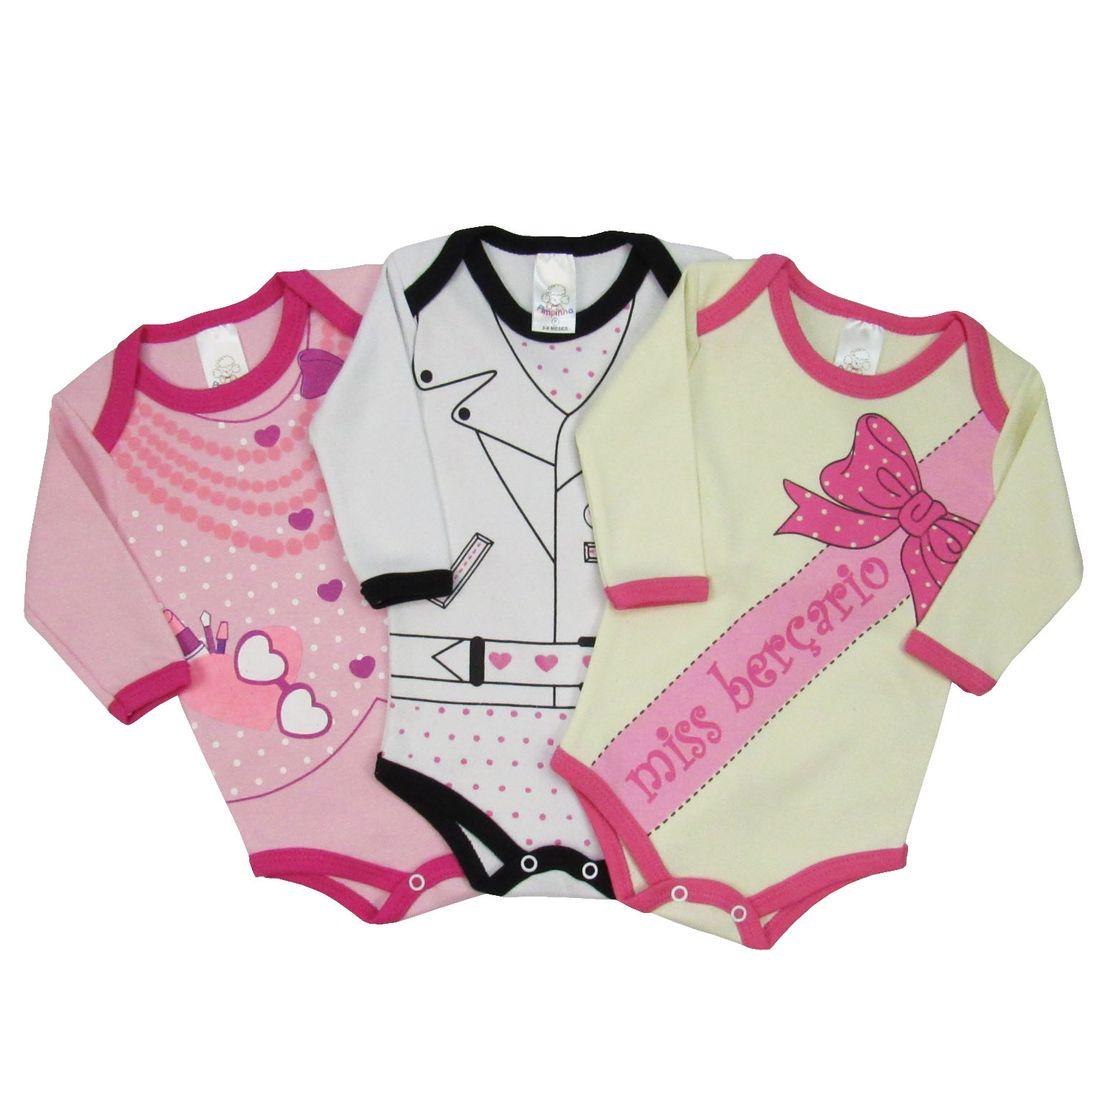 2353a6b42 Body Bebê Manga Longa Feminina Frases Divertidas Kit com 3 ...